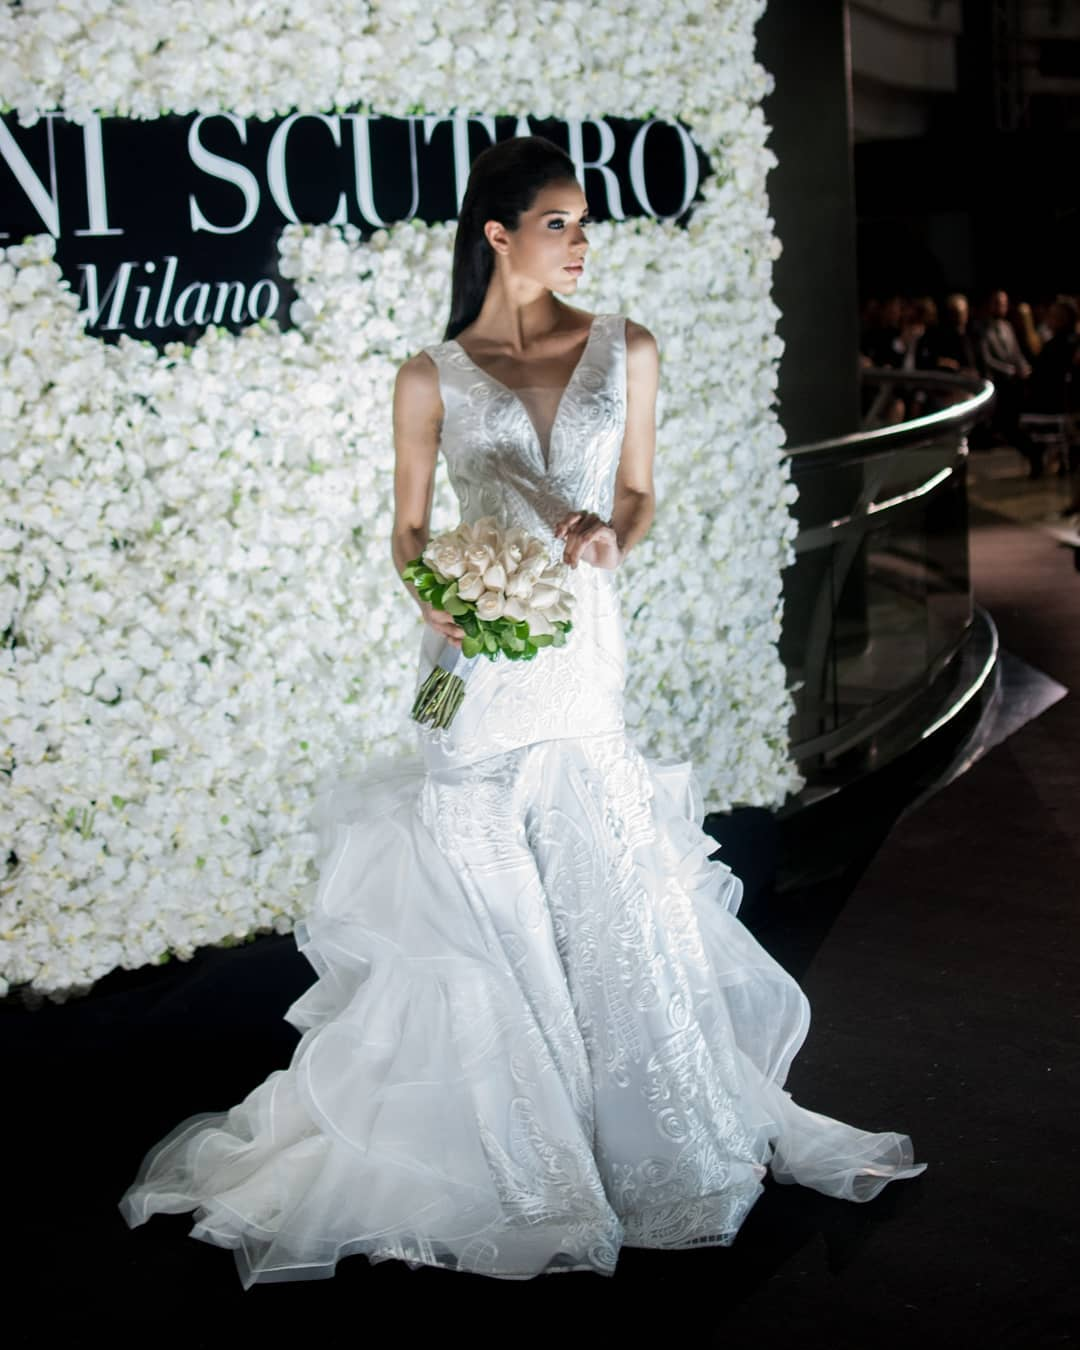 thalia olvino, top 20 de miss universe 2019. - Página 4 70842010